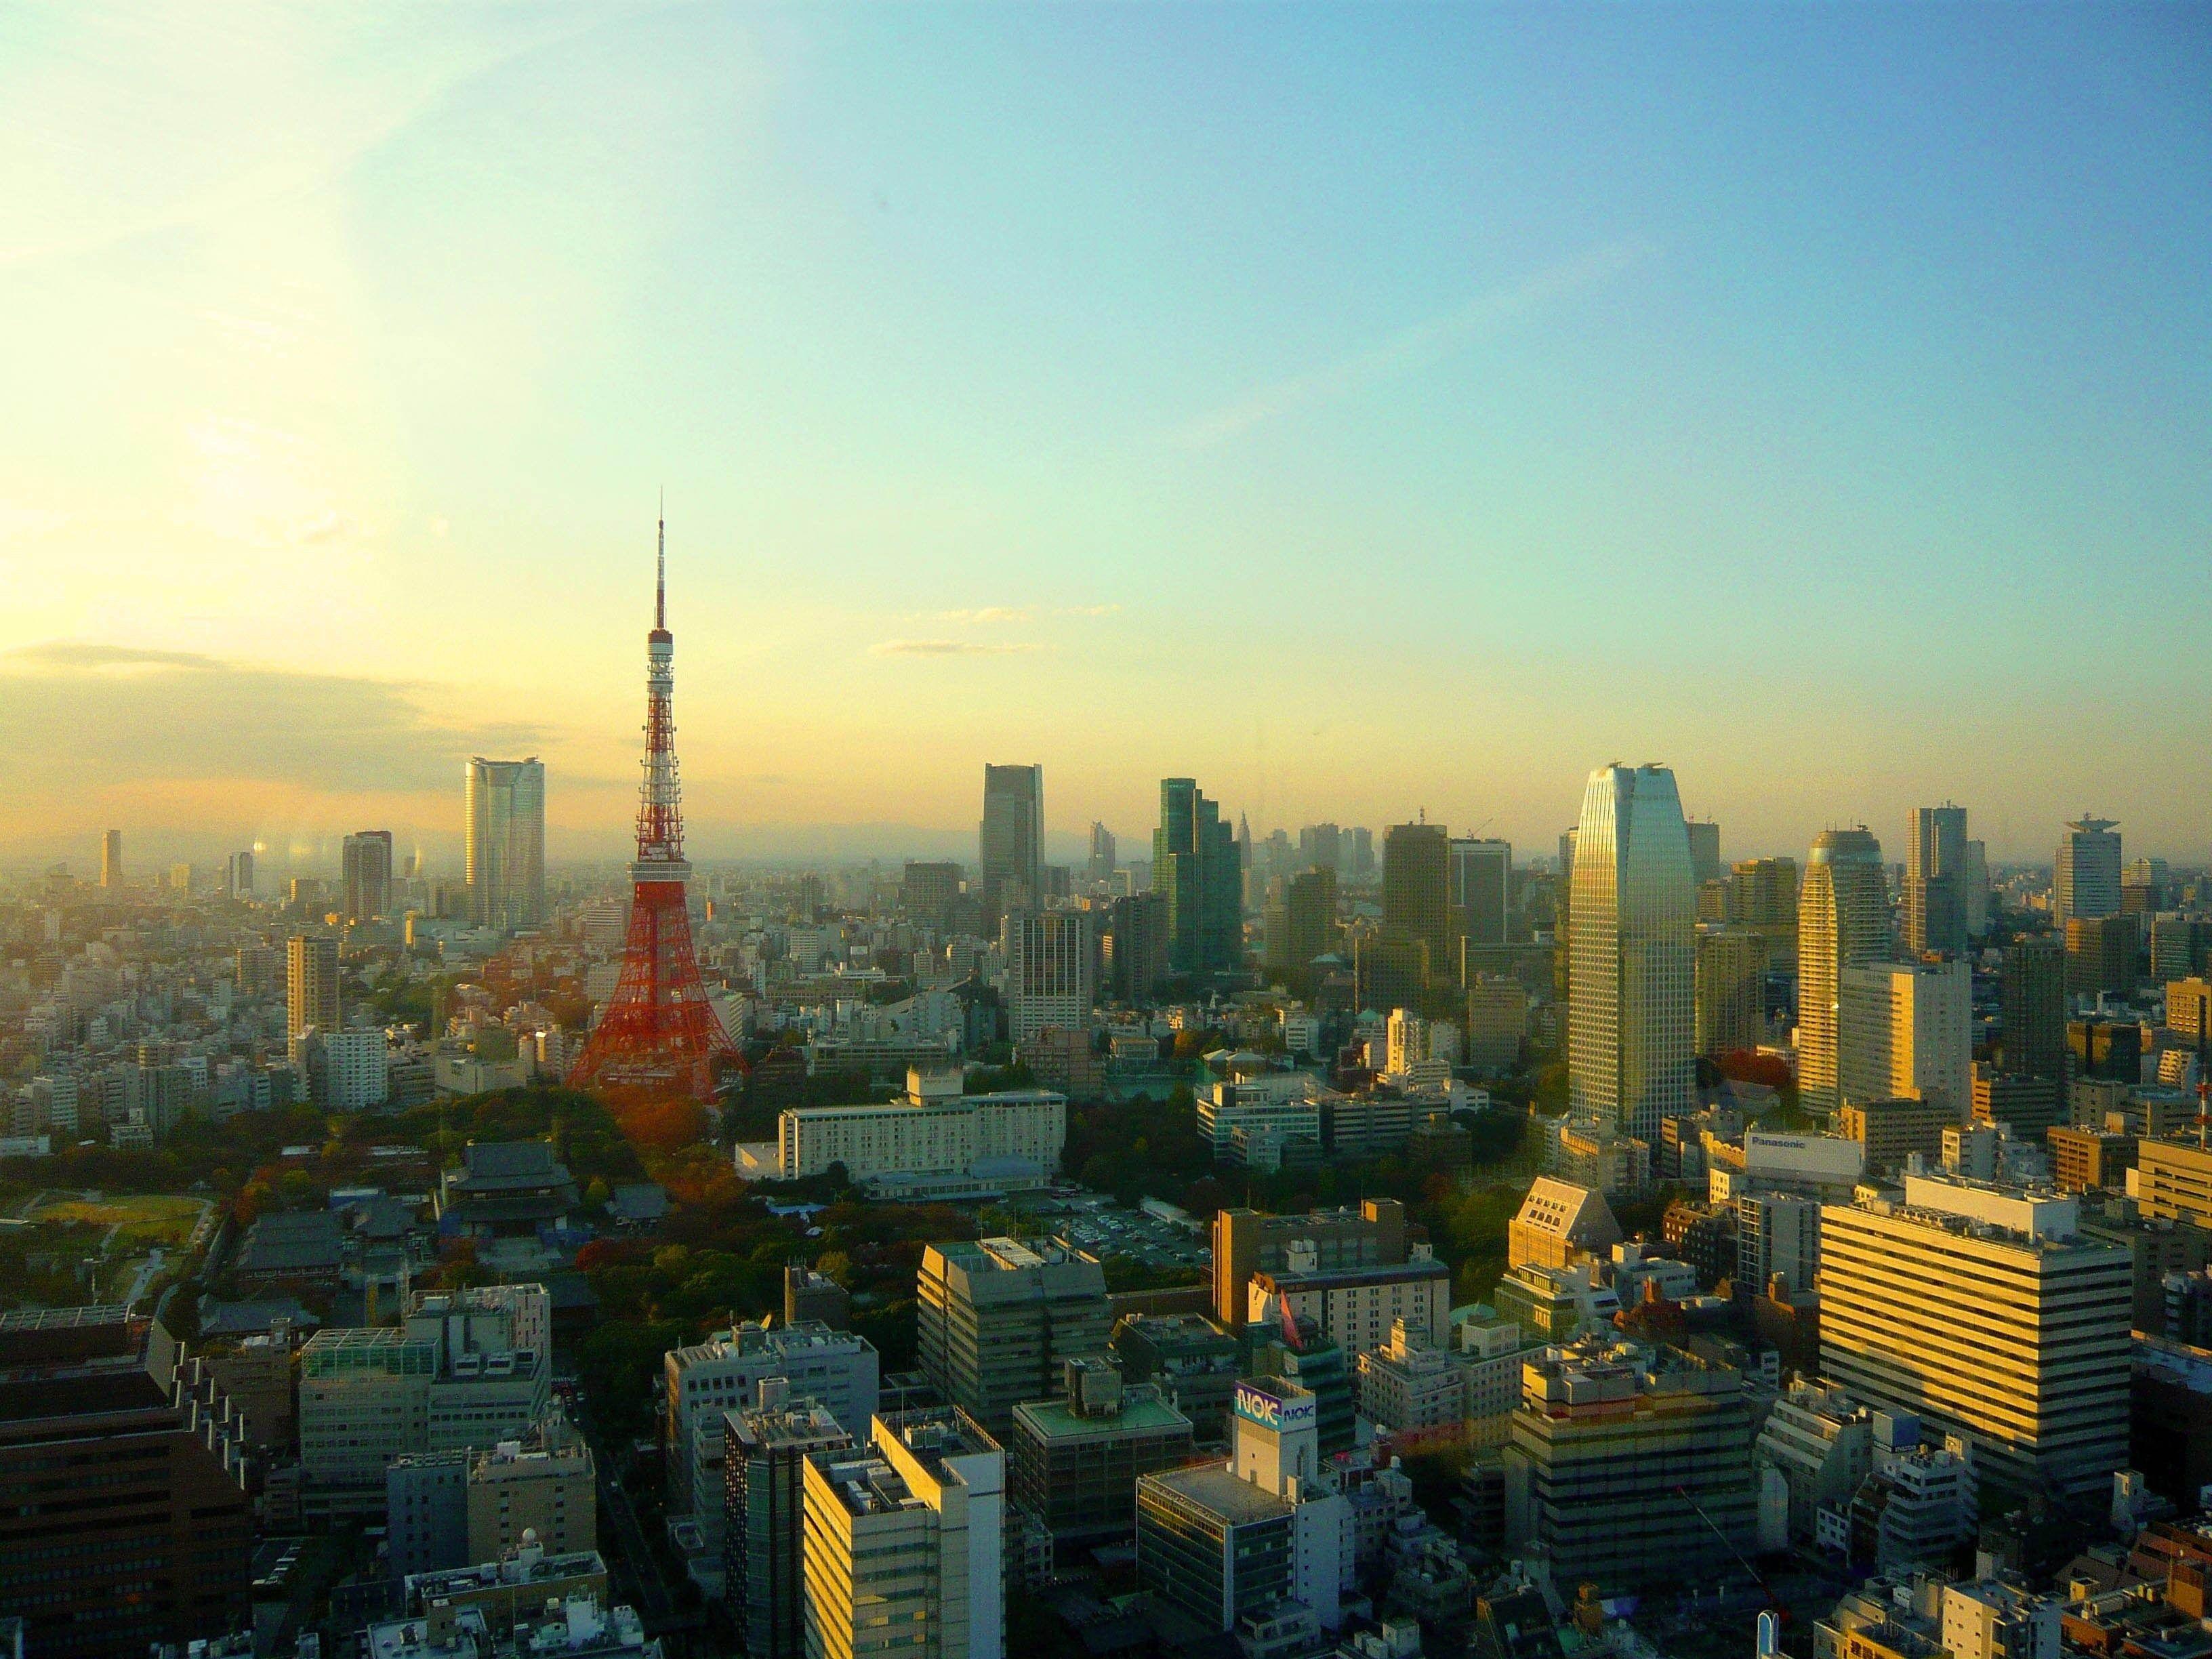 3264x2448 Px Windows Wallpaper Tokyo By Edite Robertson For